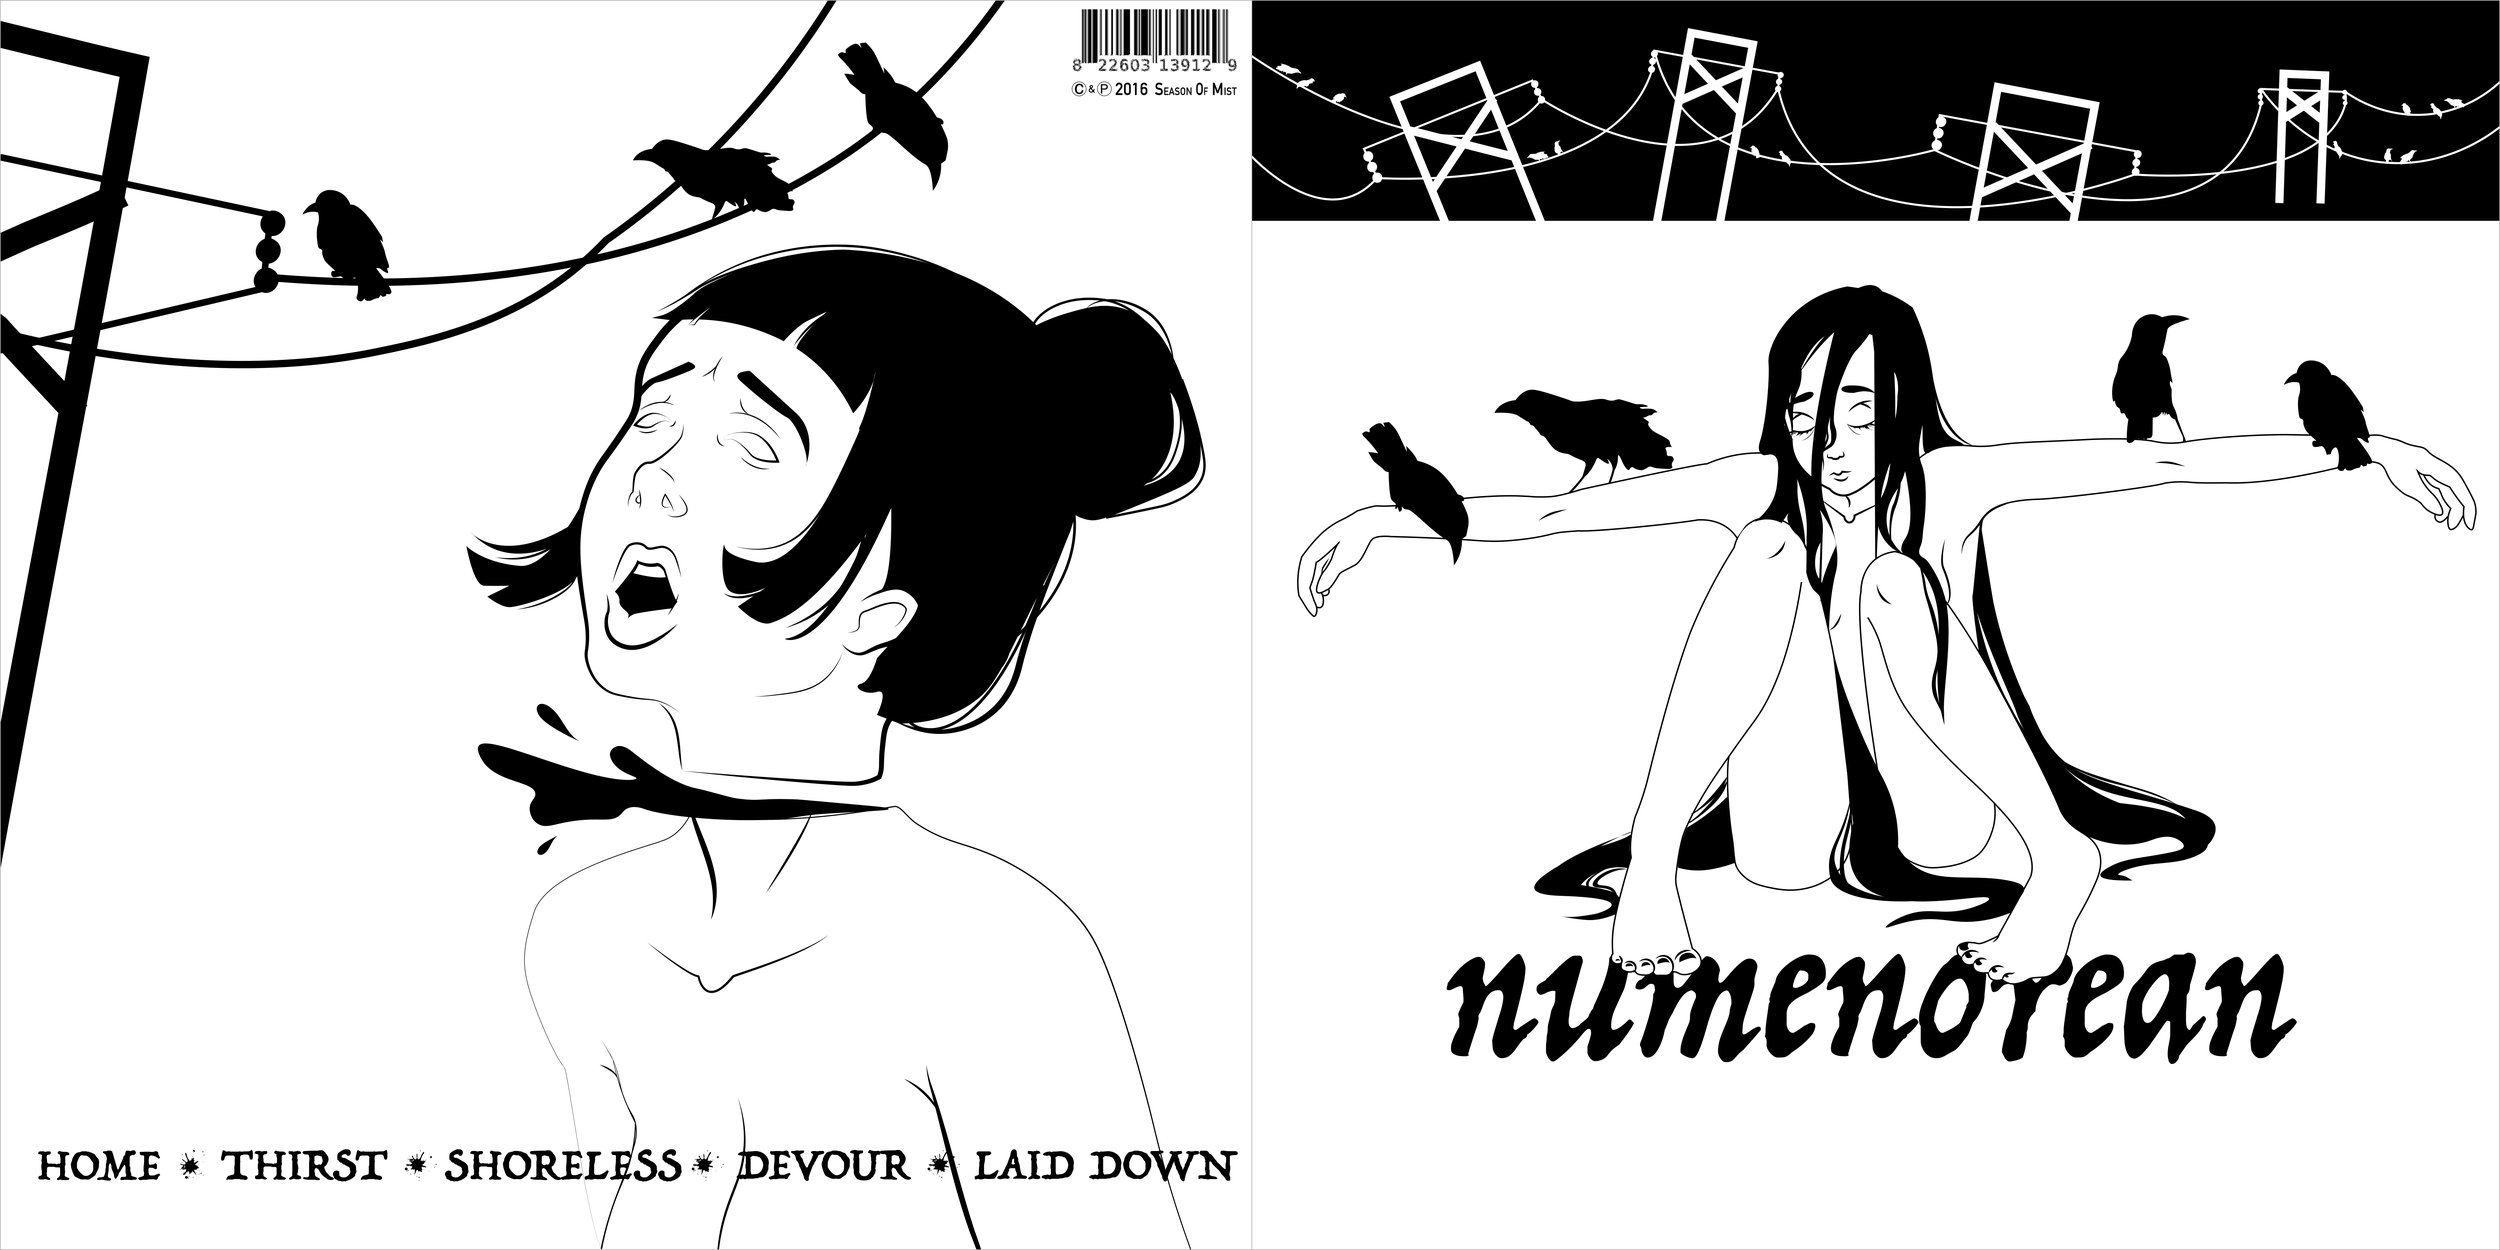 ART325 Page Layout - Record Album: Ashton McGehee